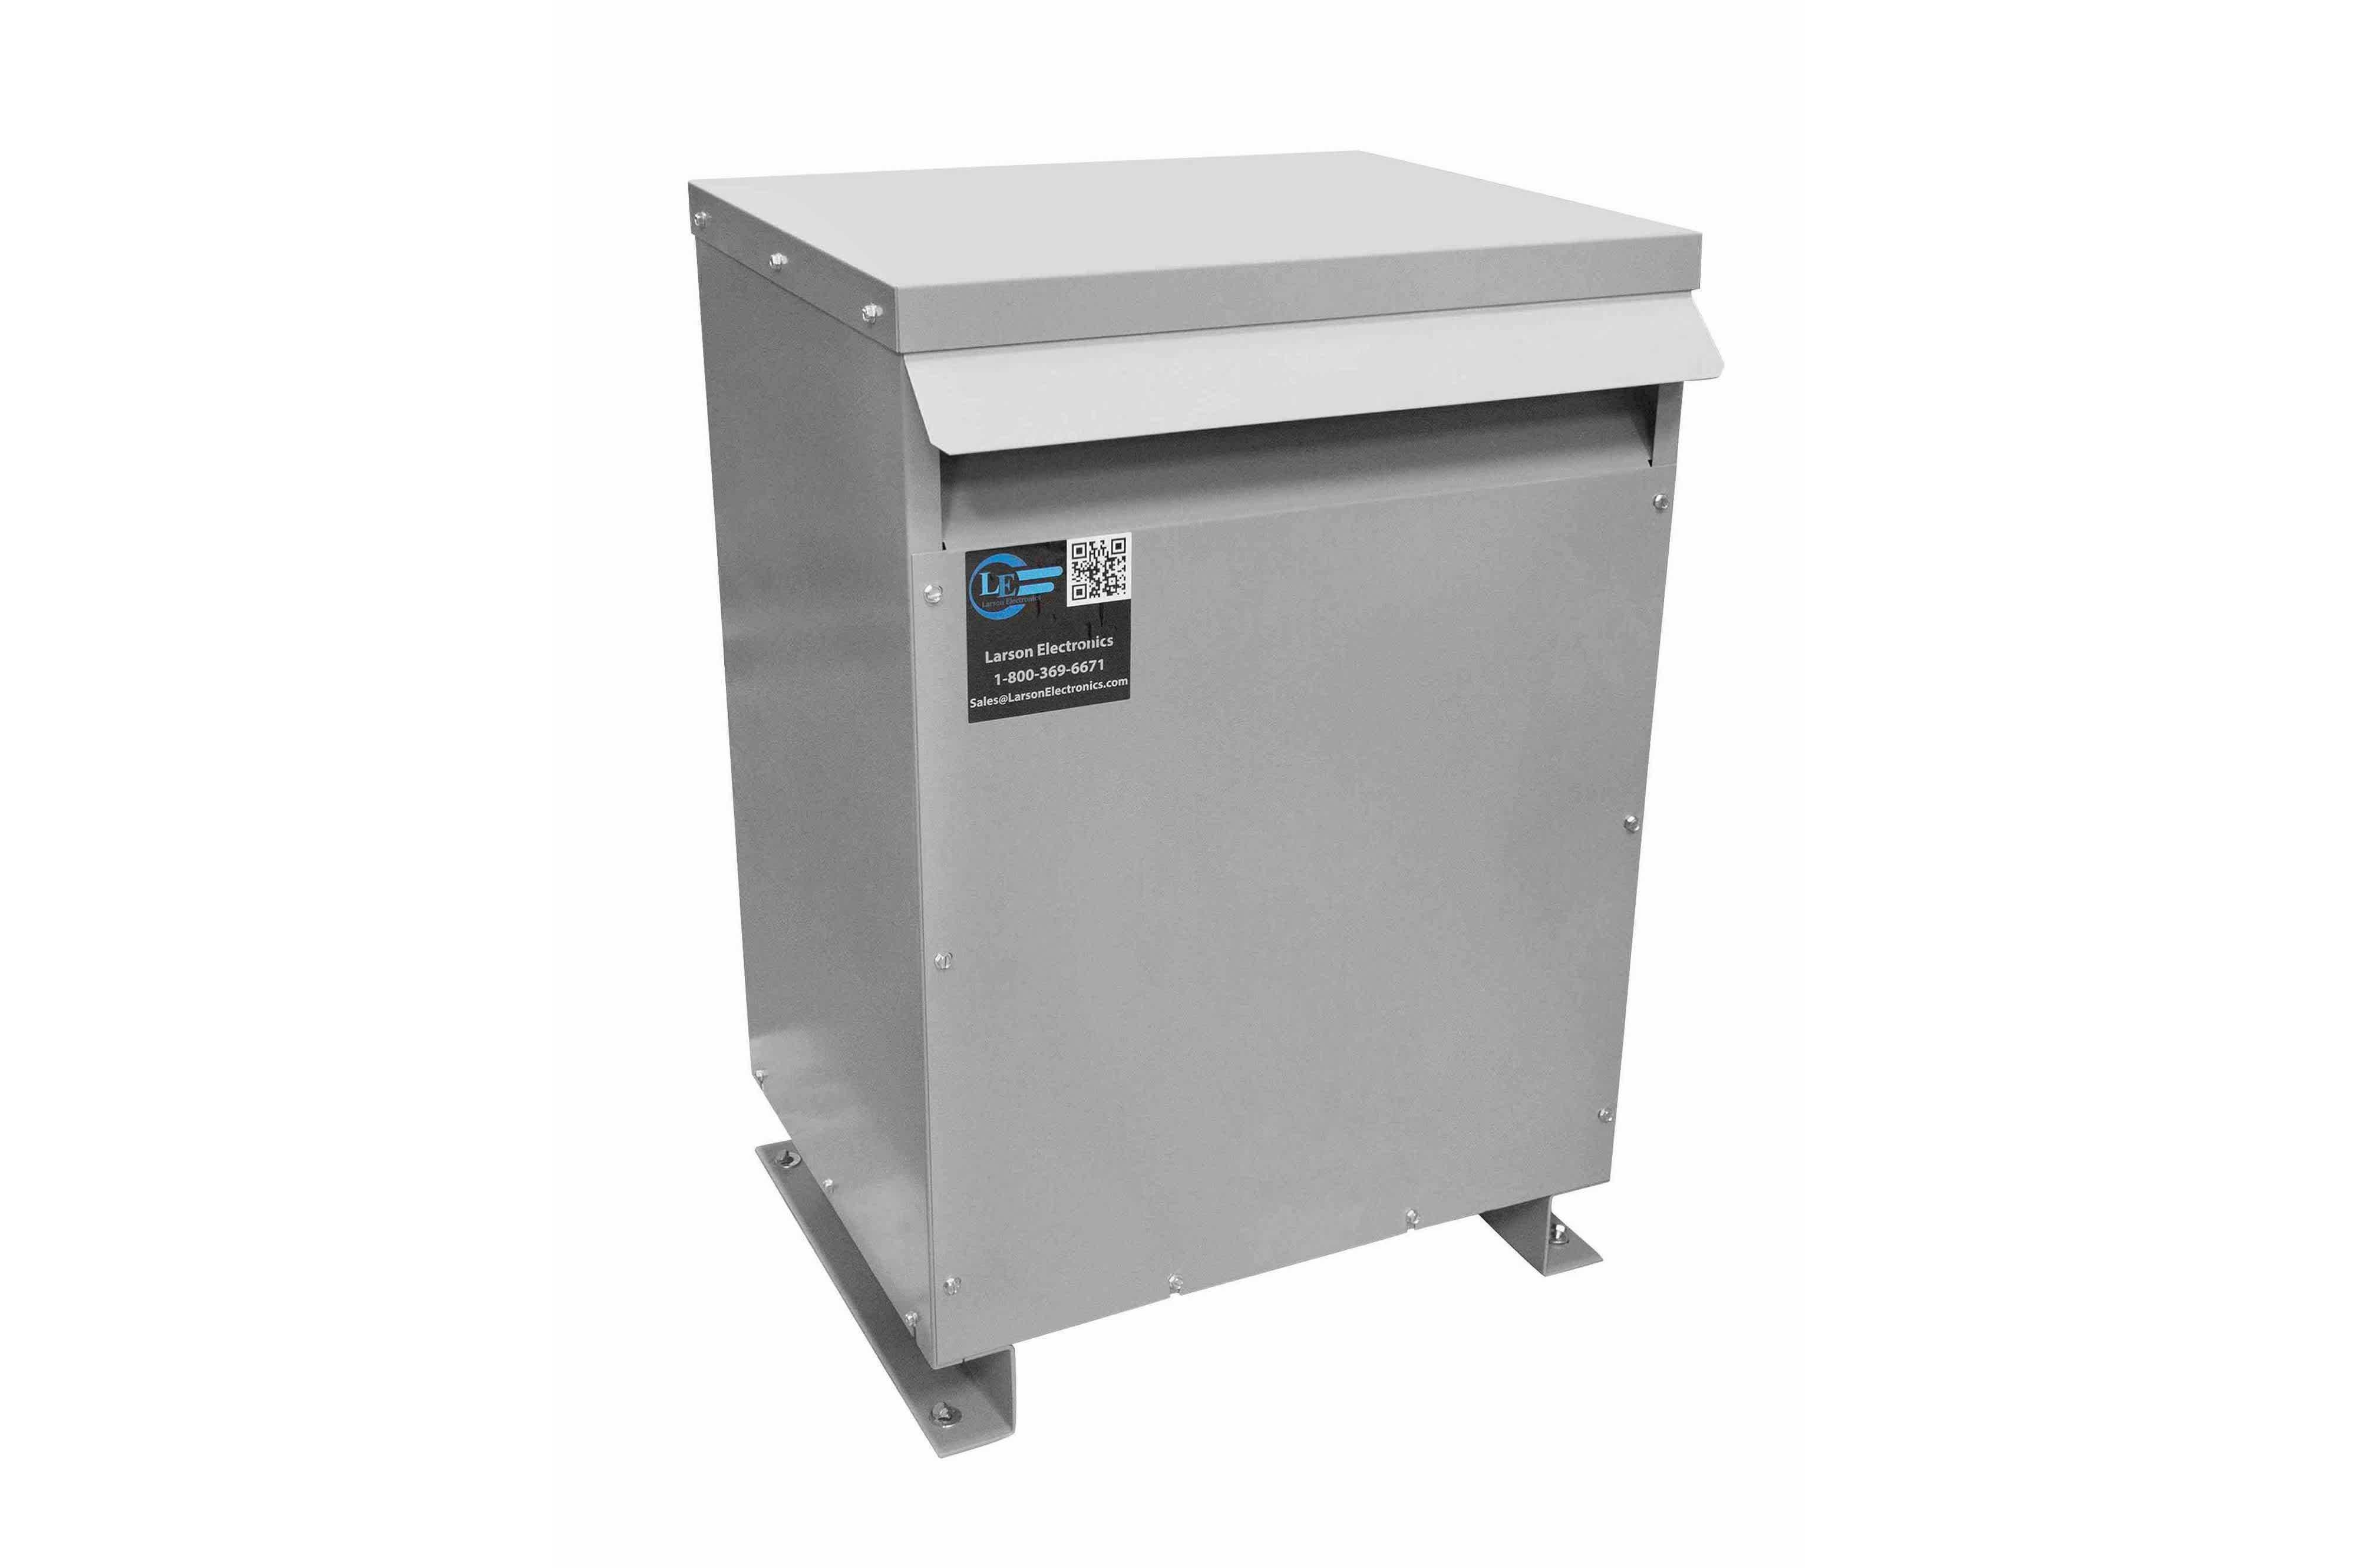 500 kVA 3PH DOE Transformer, 240V Delta Primary, 208Y/120 Wye-N Secondary, N3R, Ventilated, 60 Hz